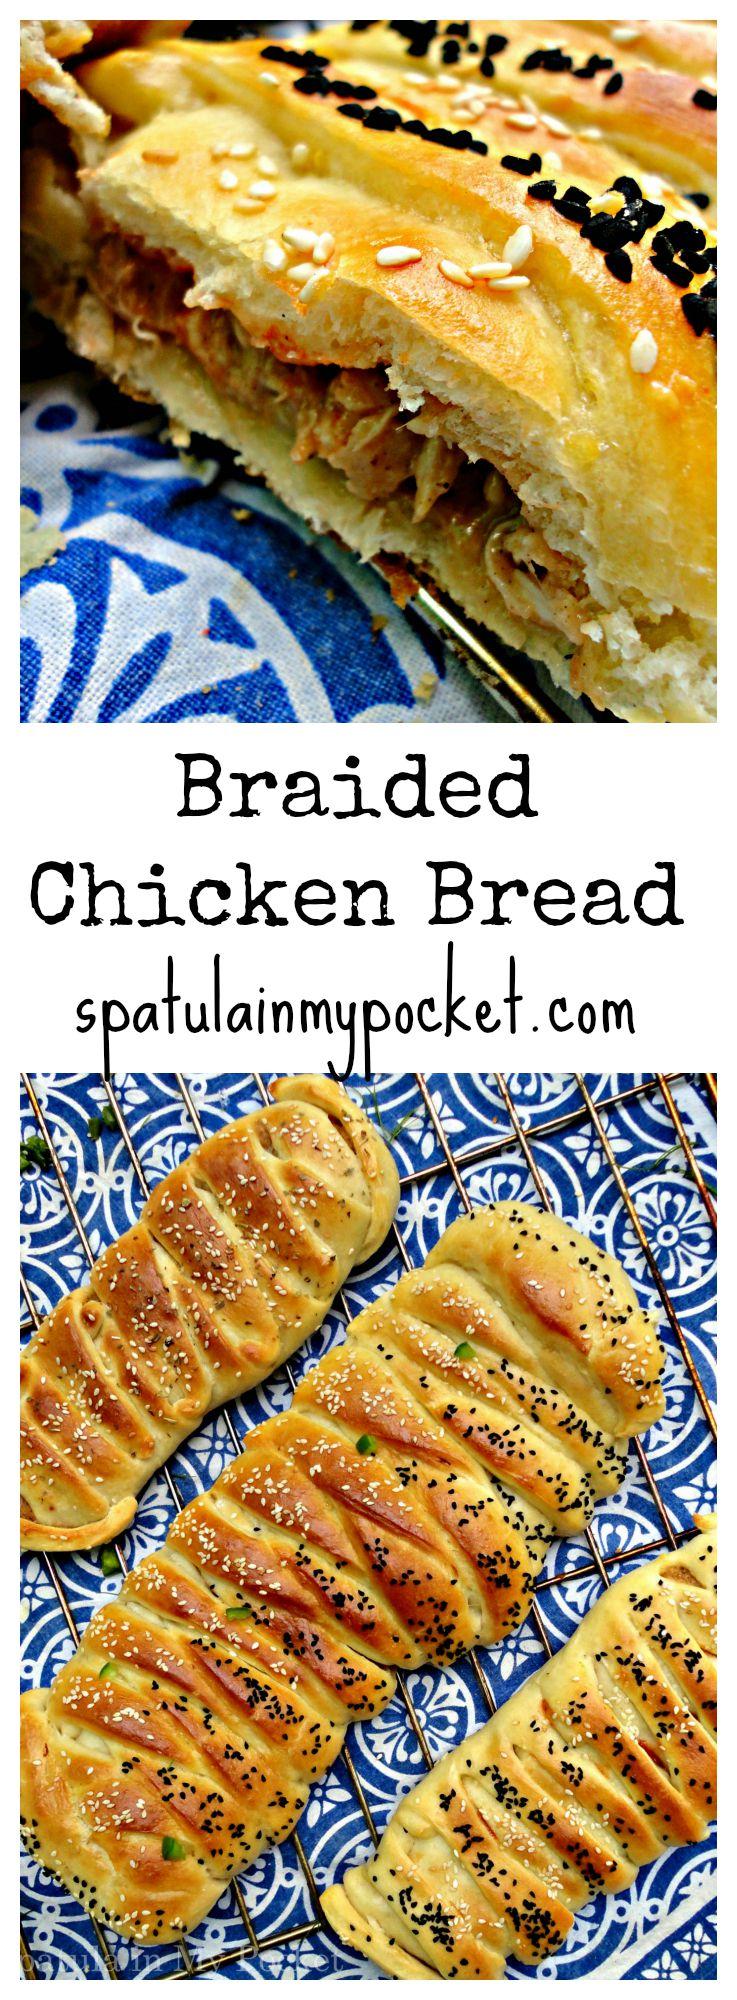 Easy Braided Chicken Bread Spatula In My Pocket